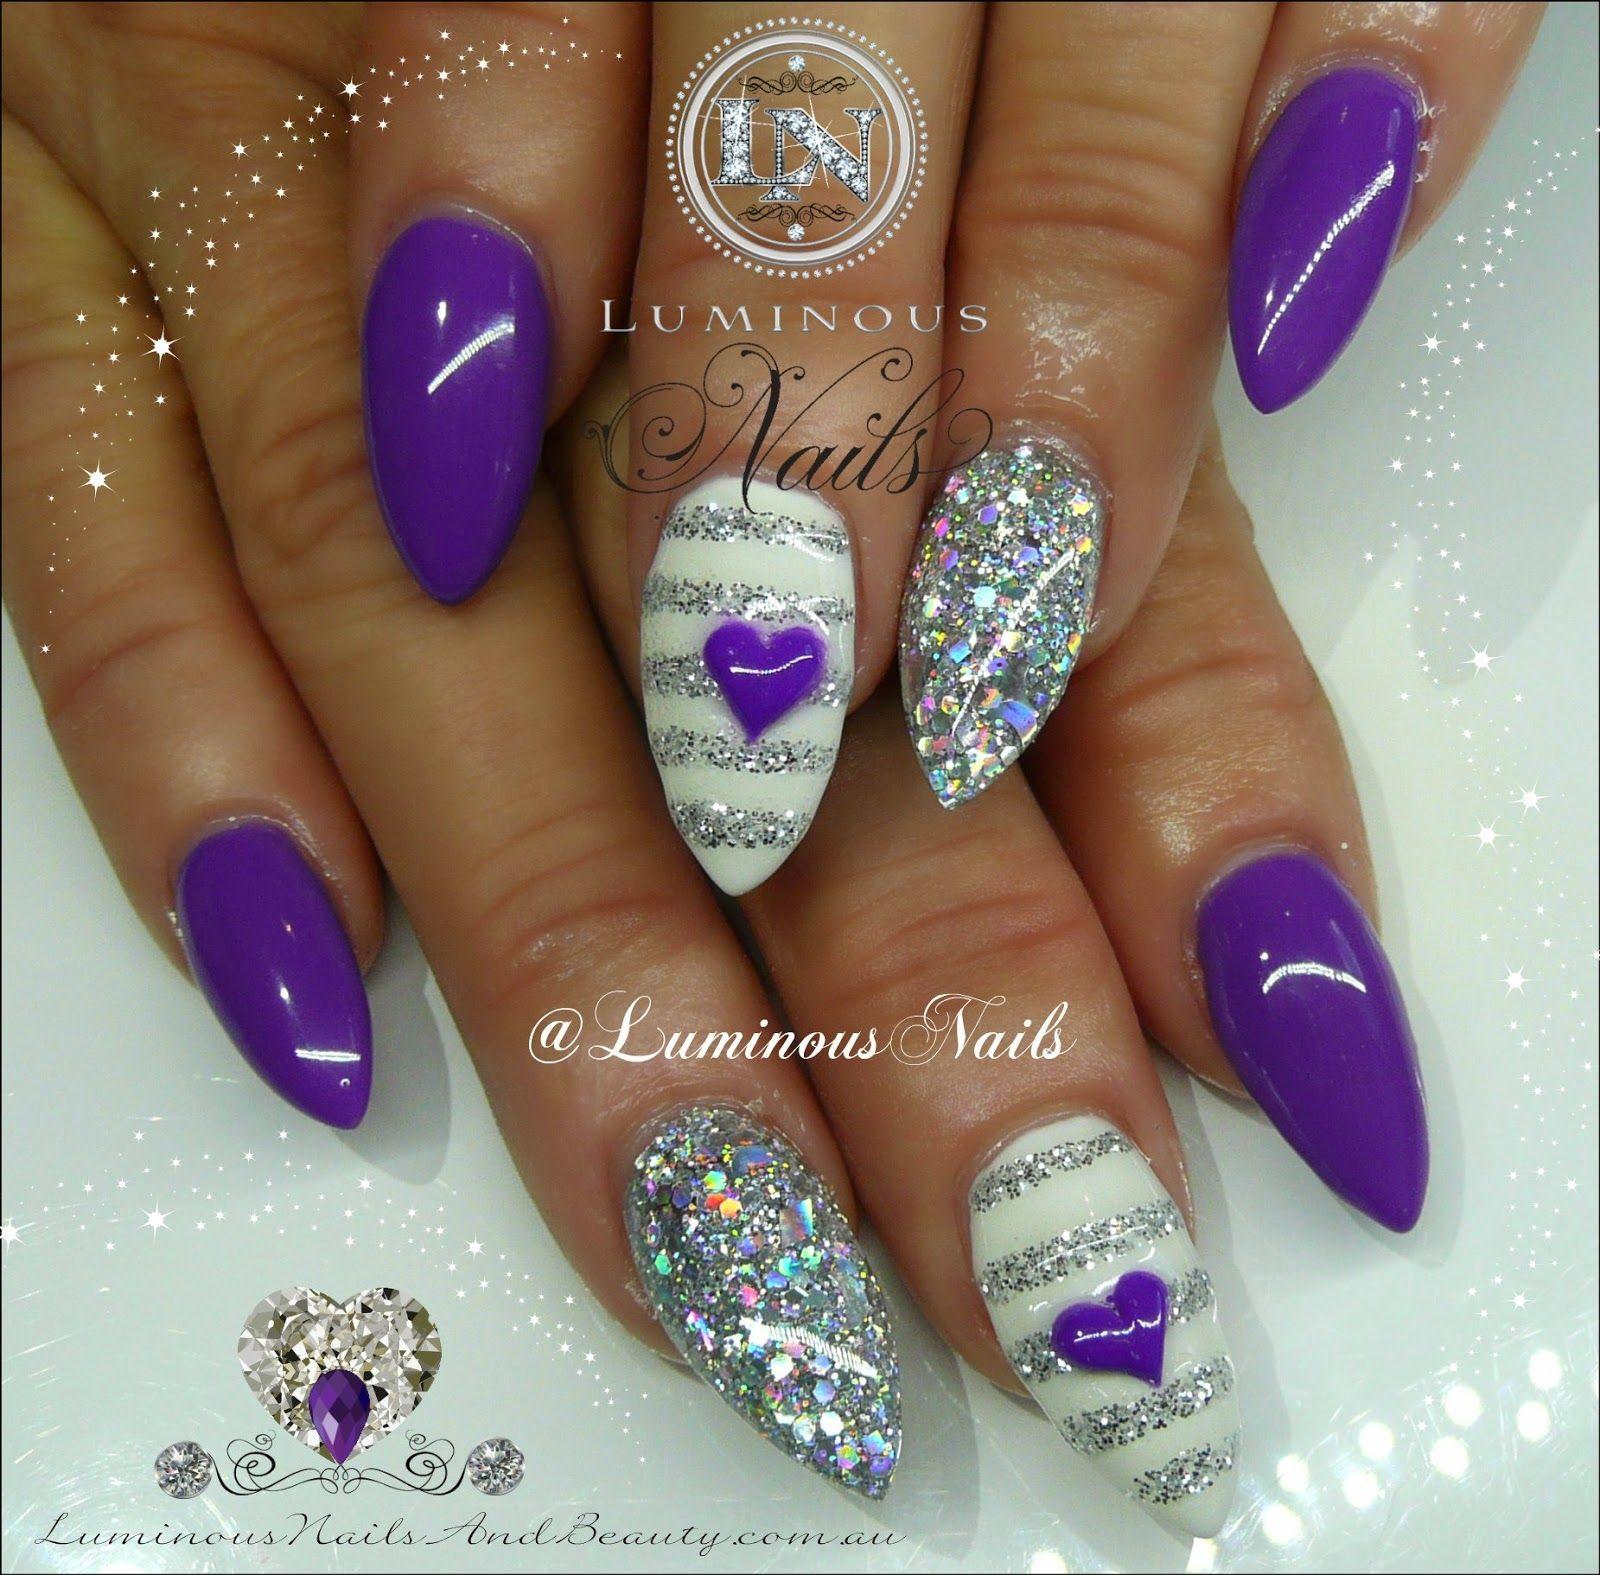 Luminousnailspurplesilverwhitenails nails luminousnailspurplesilverwhitenails prinsesfo Gallery